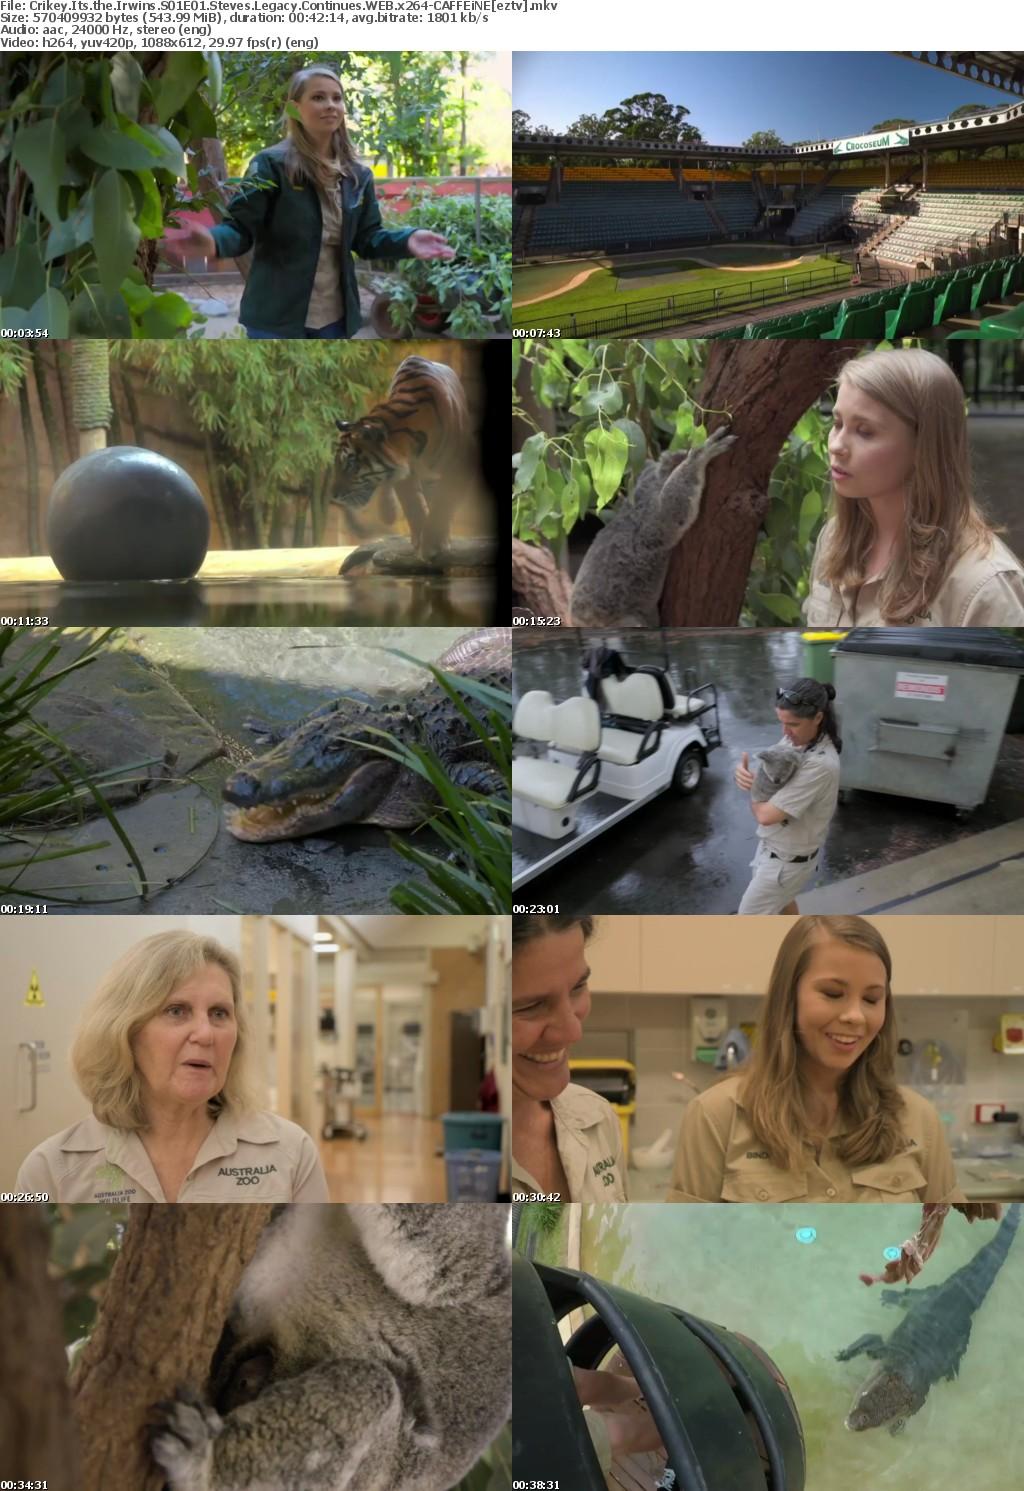 Crikey Its the Irwins S01E01 Steves Legacy Continues WEB x264-CAFFEiNE